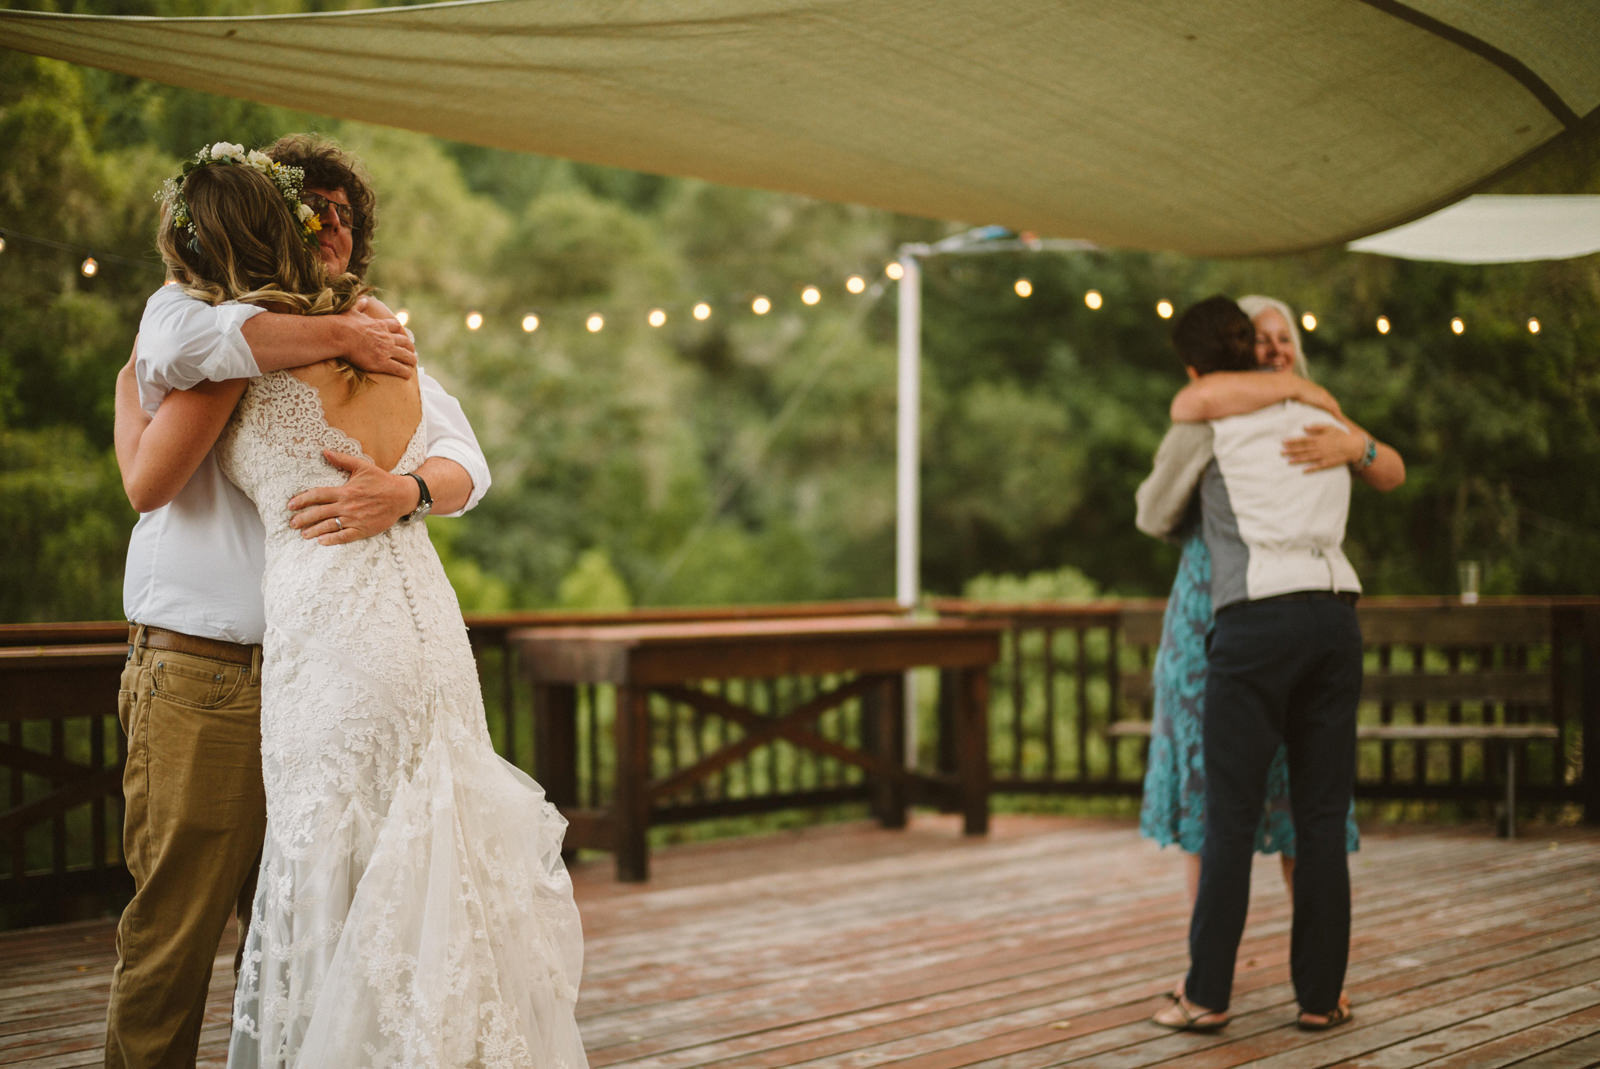 rivers-bend-retreat-wedding-102 RIVER'S BEND RETREAT WEDDING